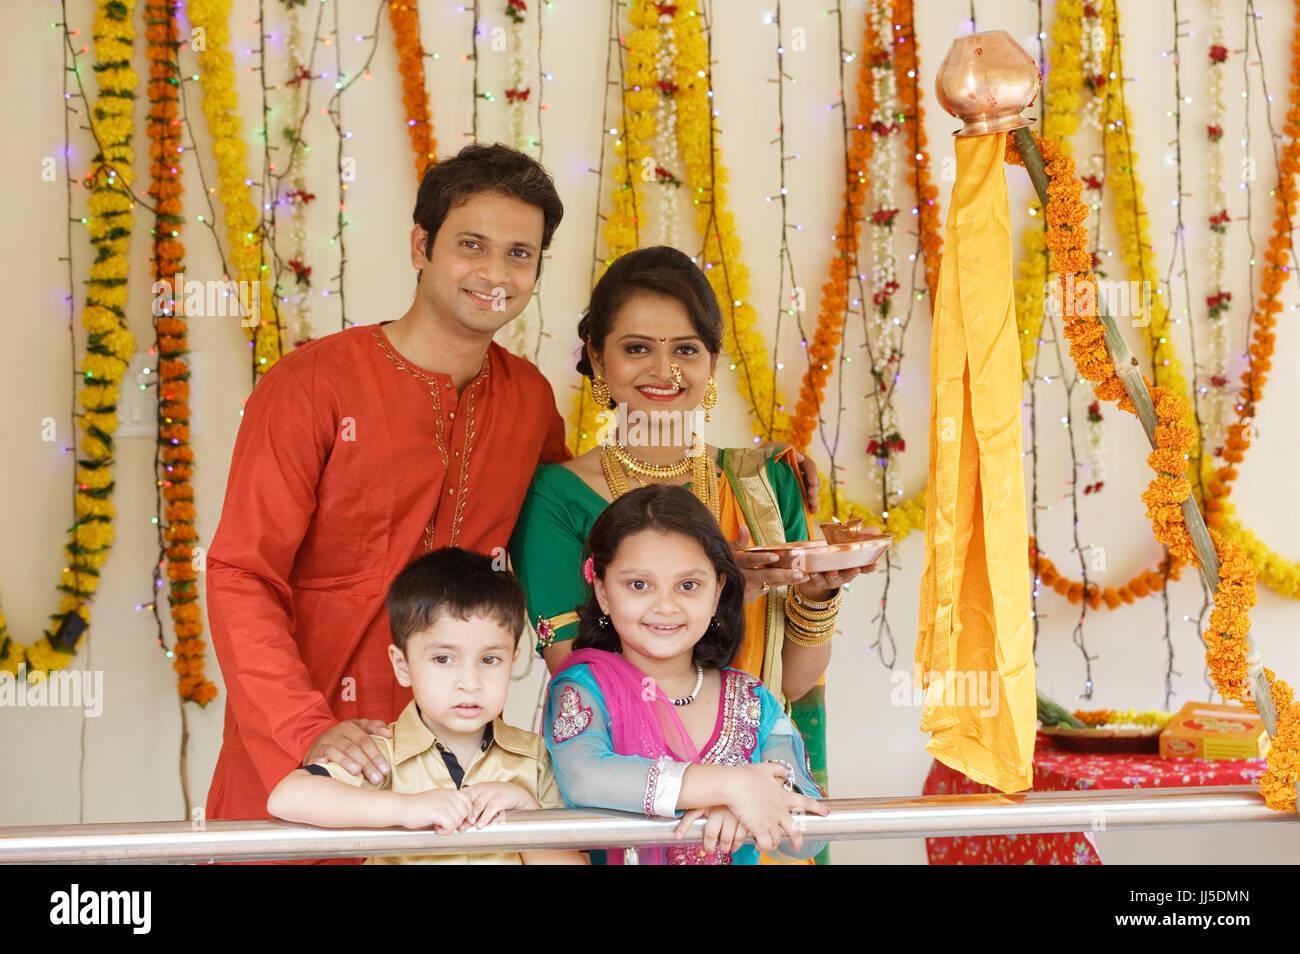 india teenager girl family stockfotos india teenager. Black Bedroom Furniture Sets. Home Design Ideas